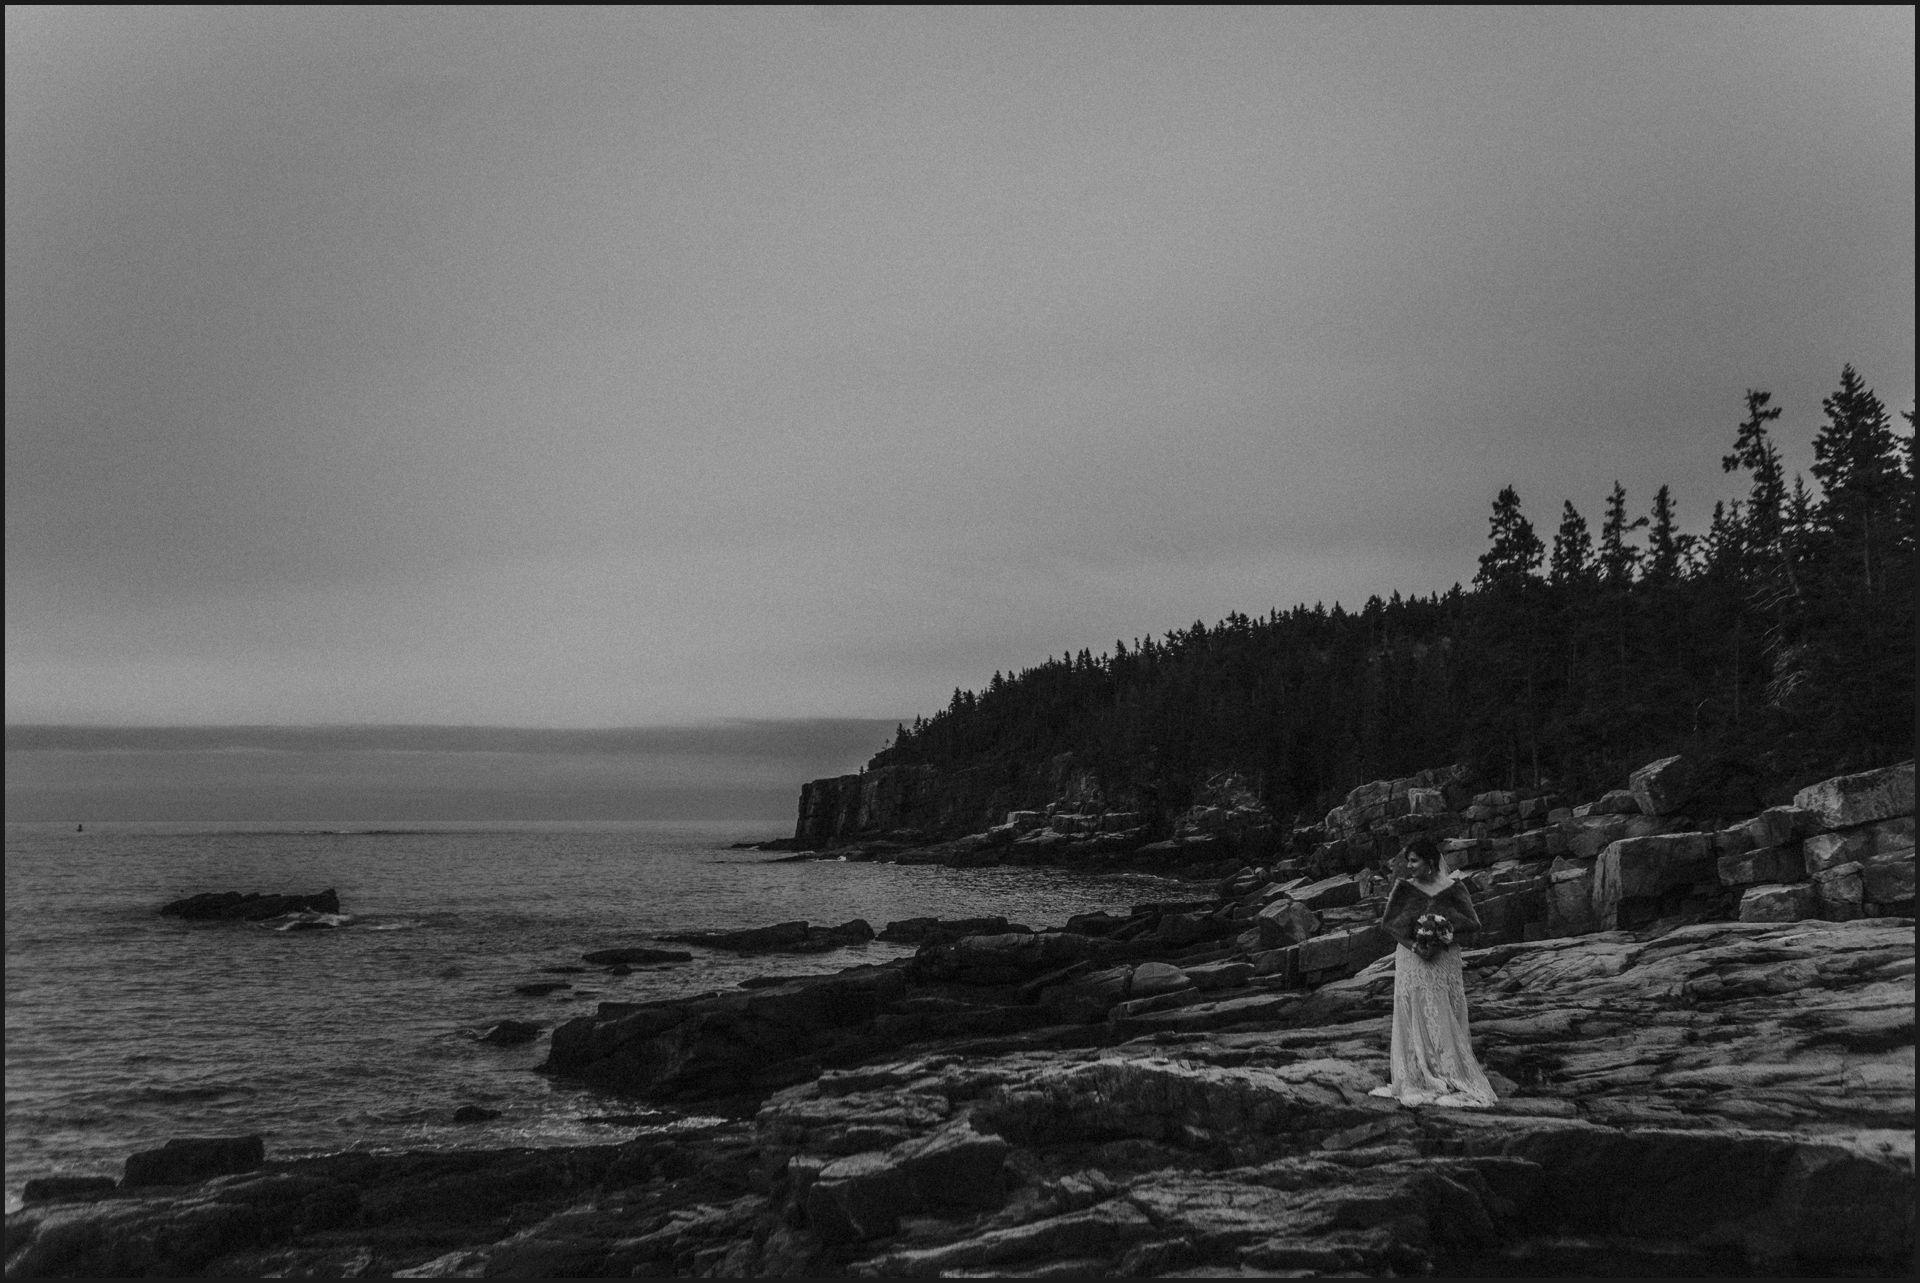 bride, groom, bar harbor, maine wedding, black and white, landscape, cliffs